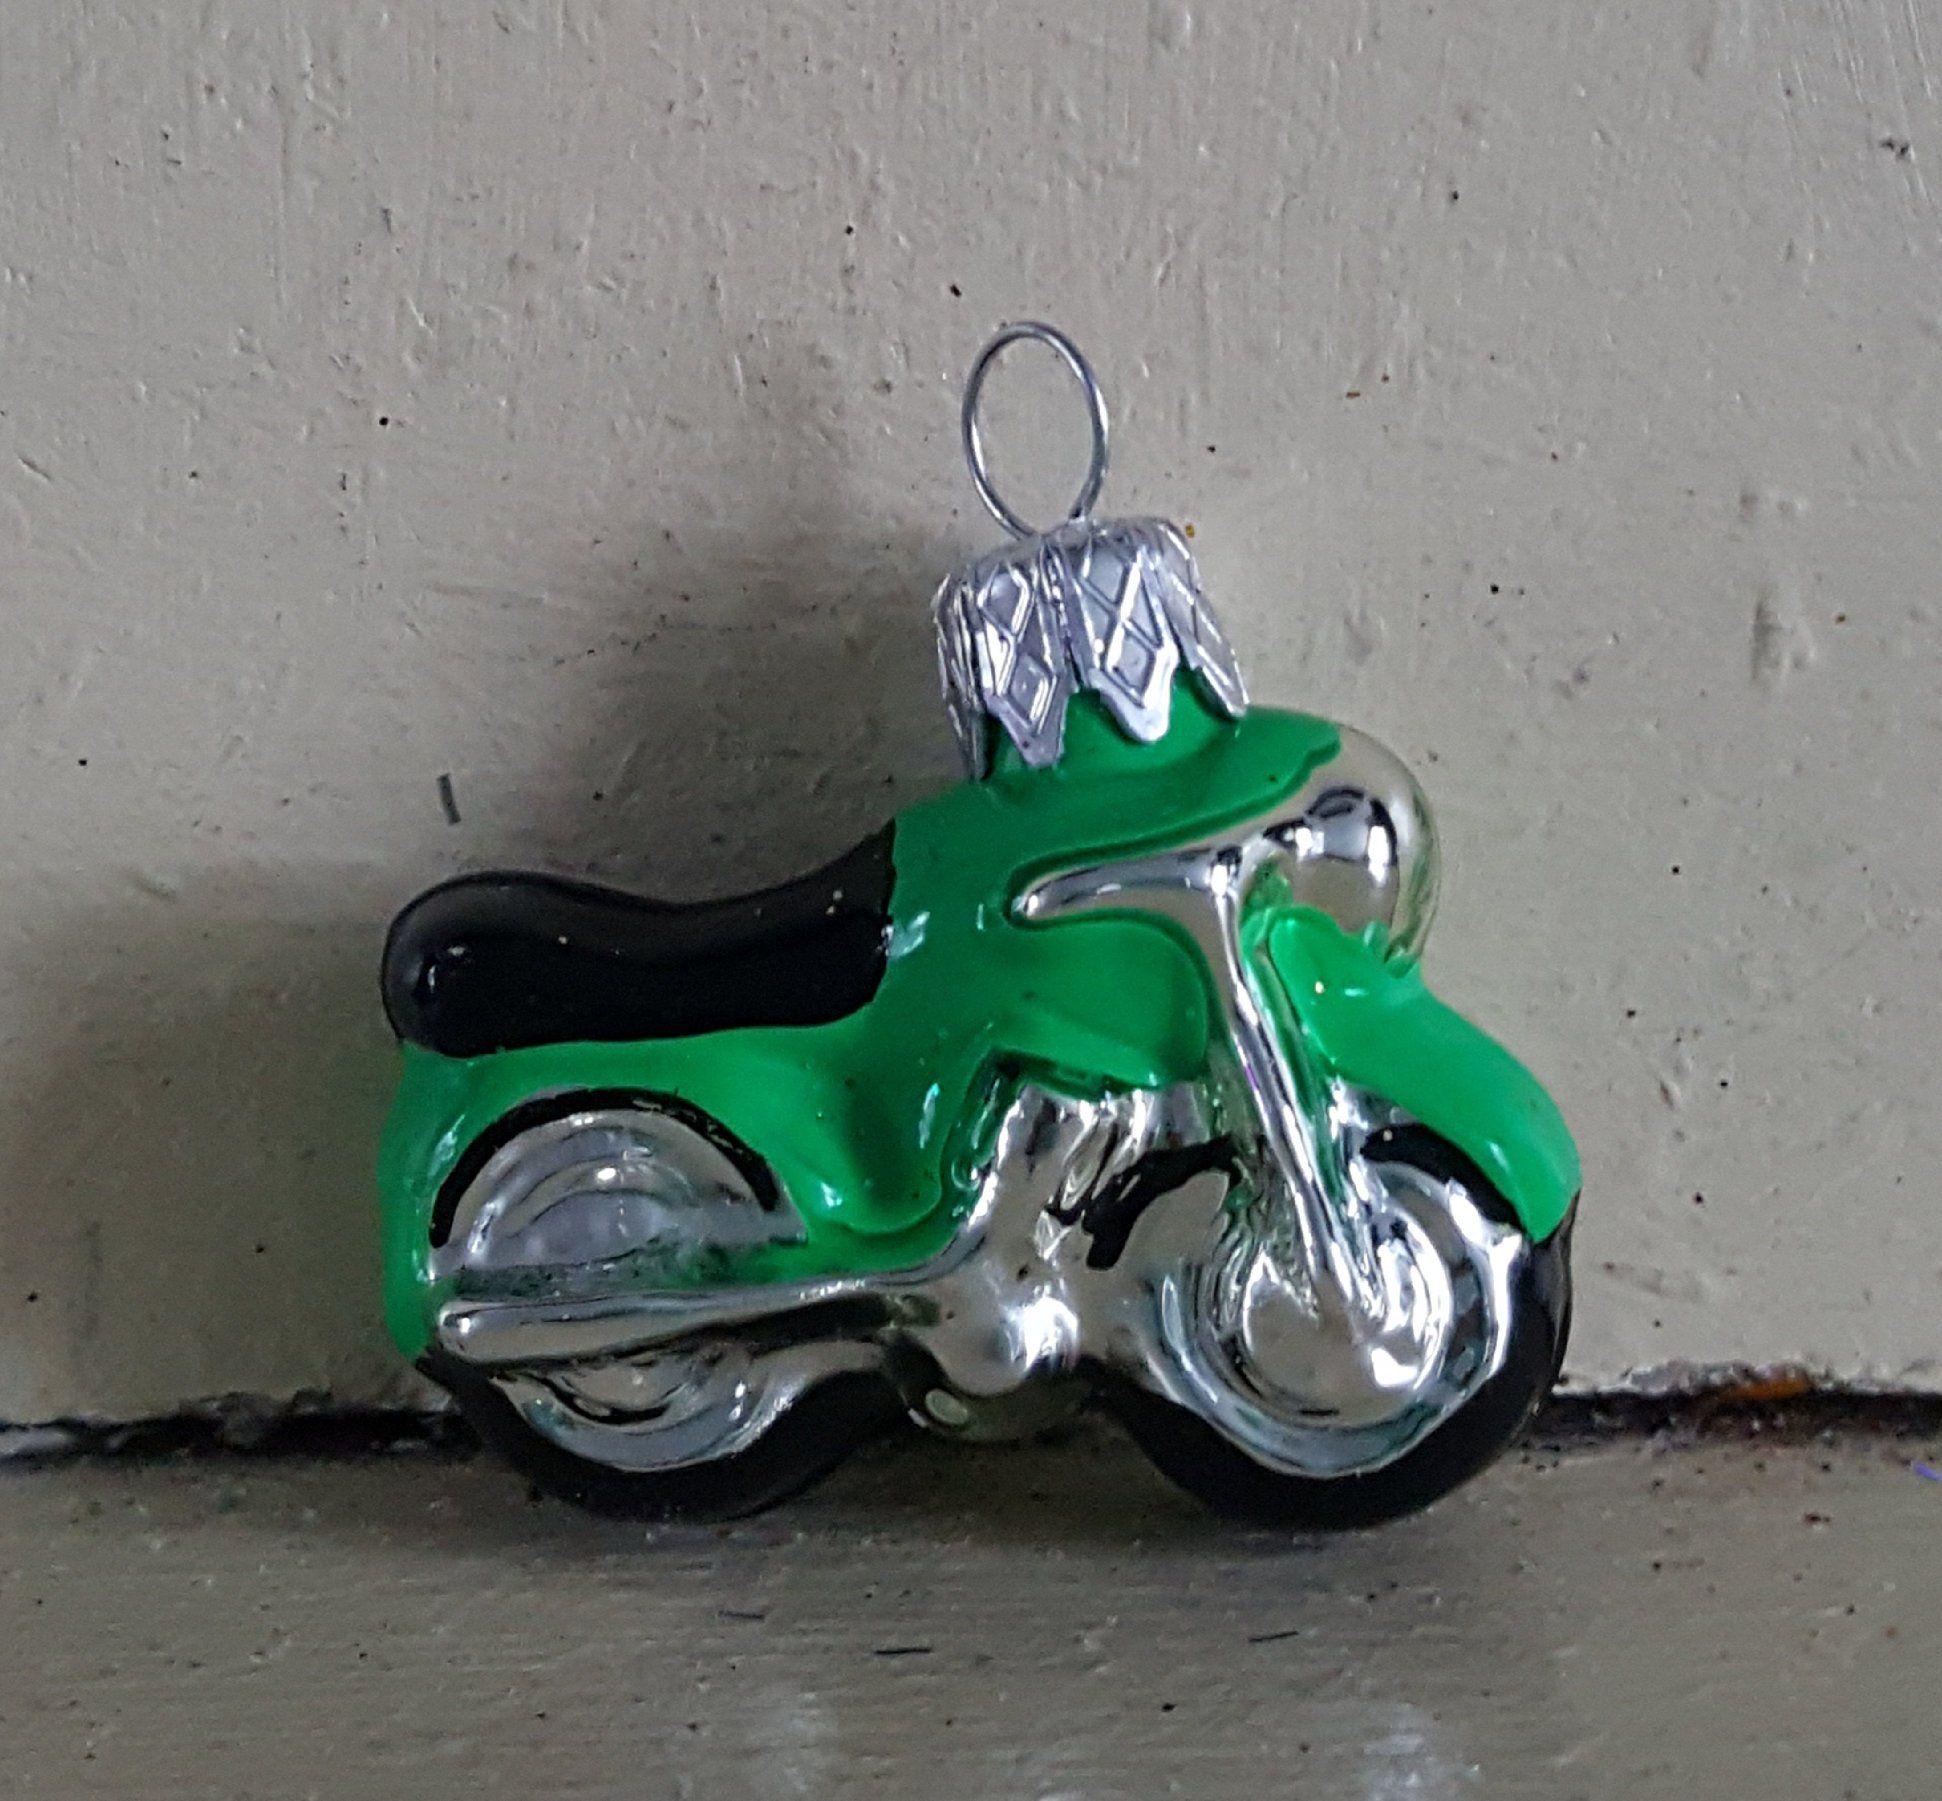 Blown Glass Mini Bright Green Motorbike Christmas Ornament 1 5 Made In Poland Glass Blowing Mini Ornaments Christmas Ornaments